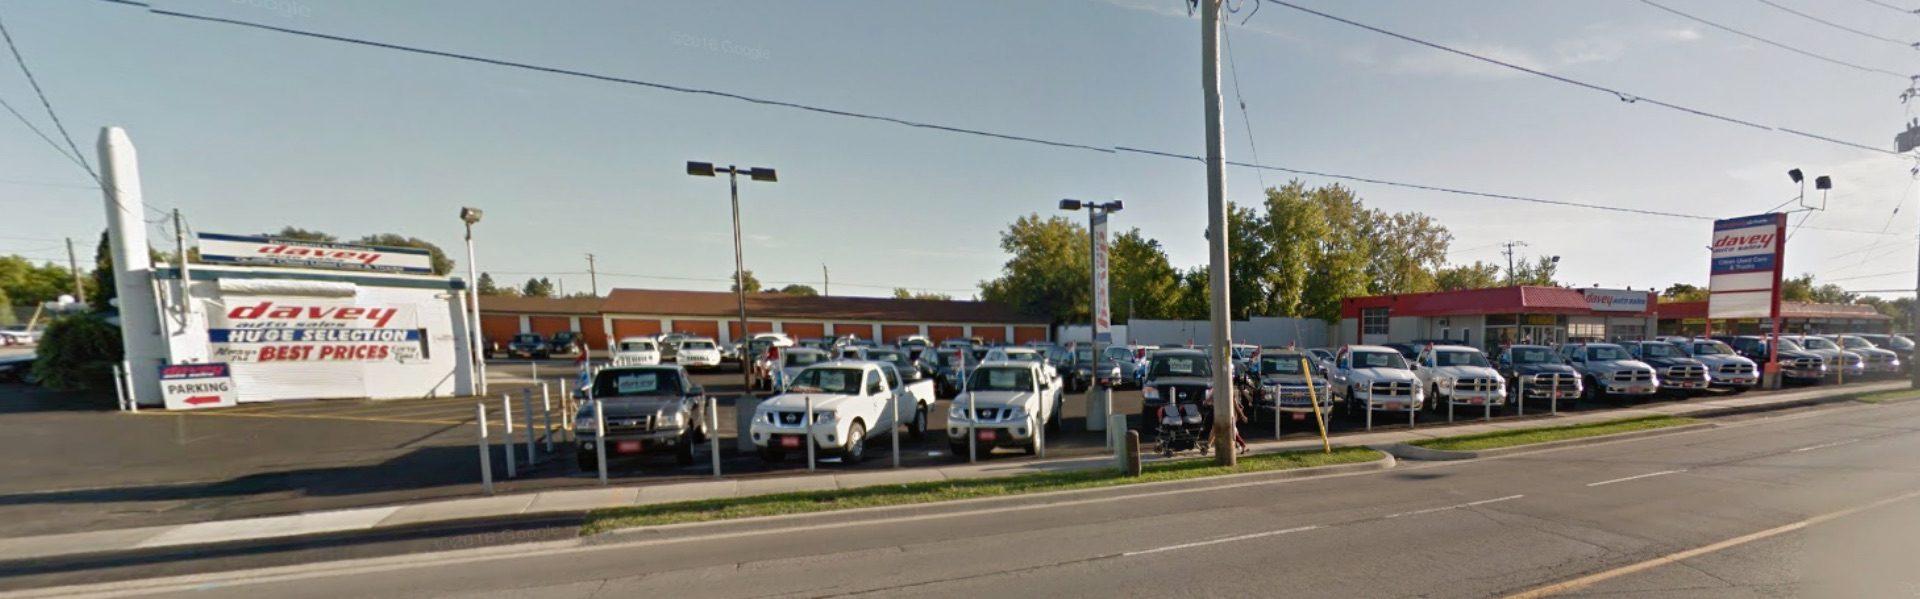 Street view of Davey Auto Sales